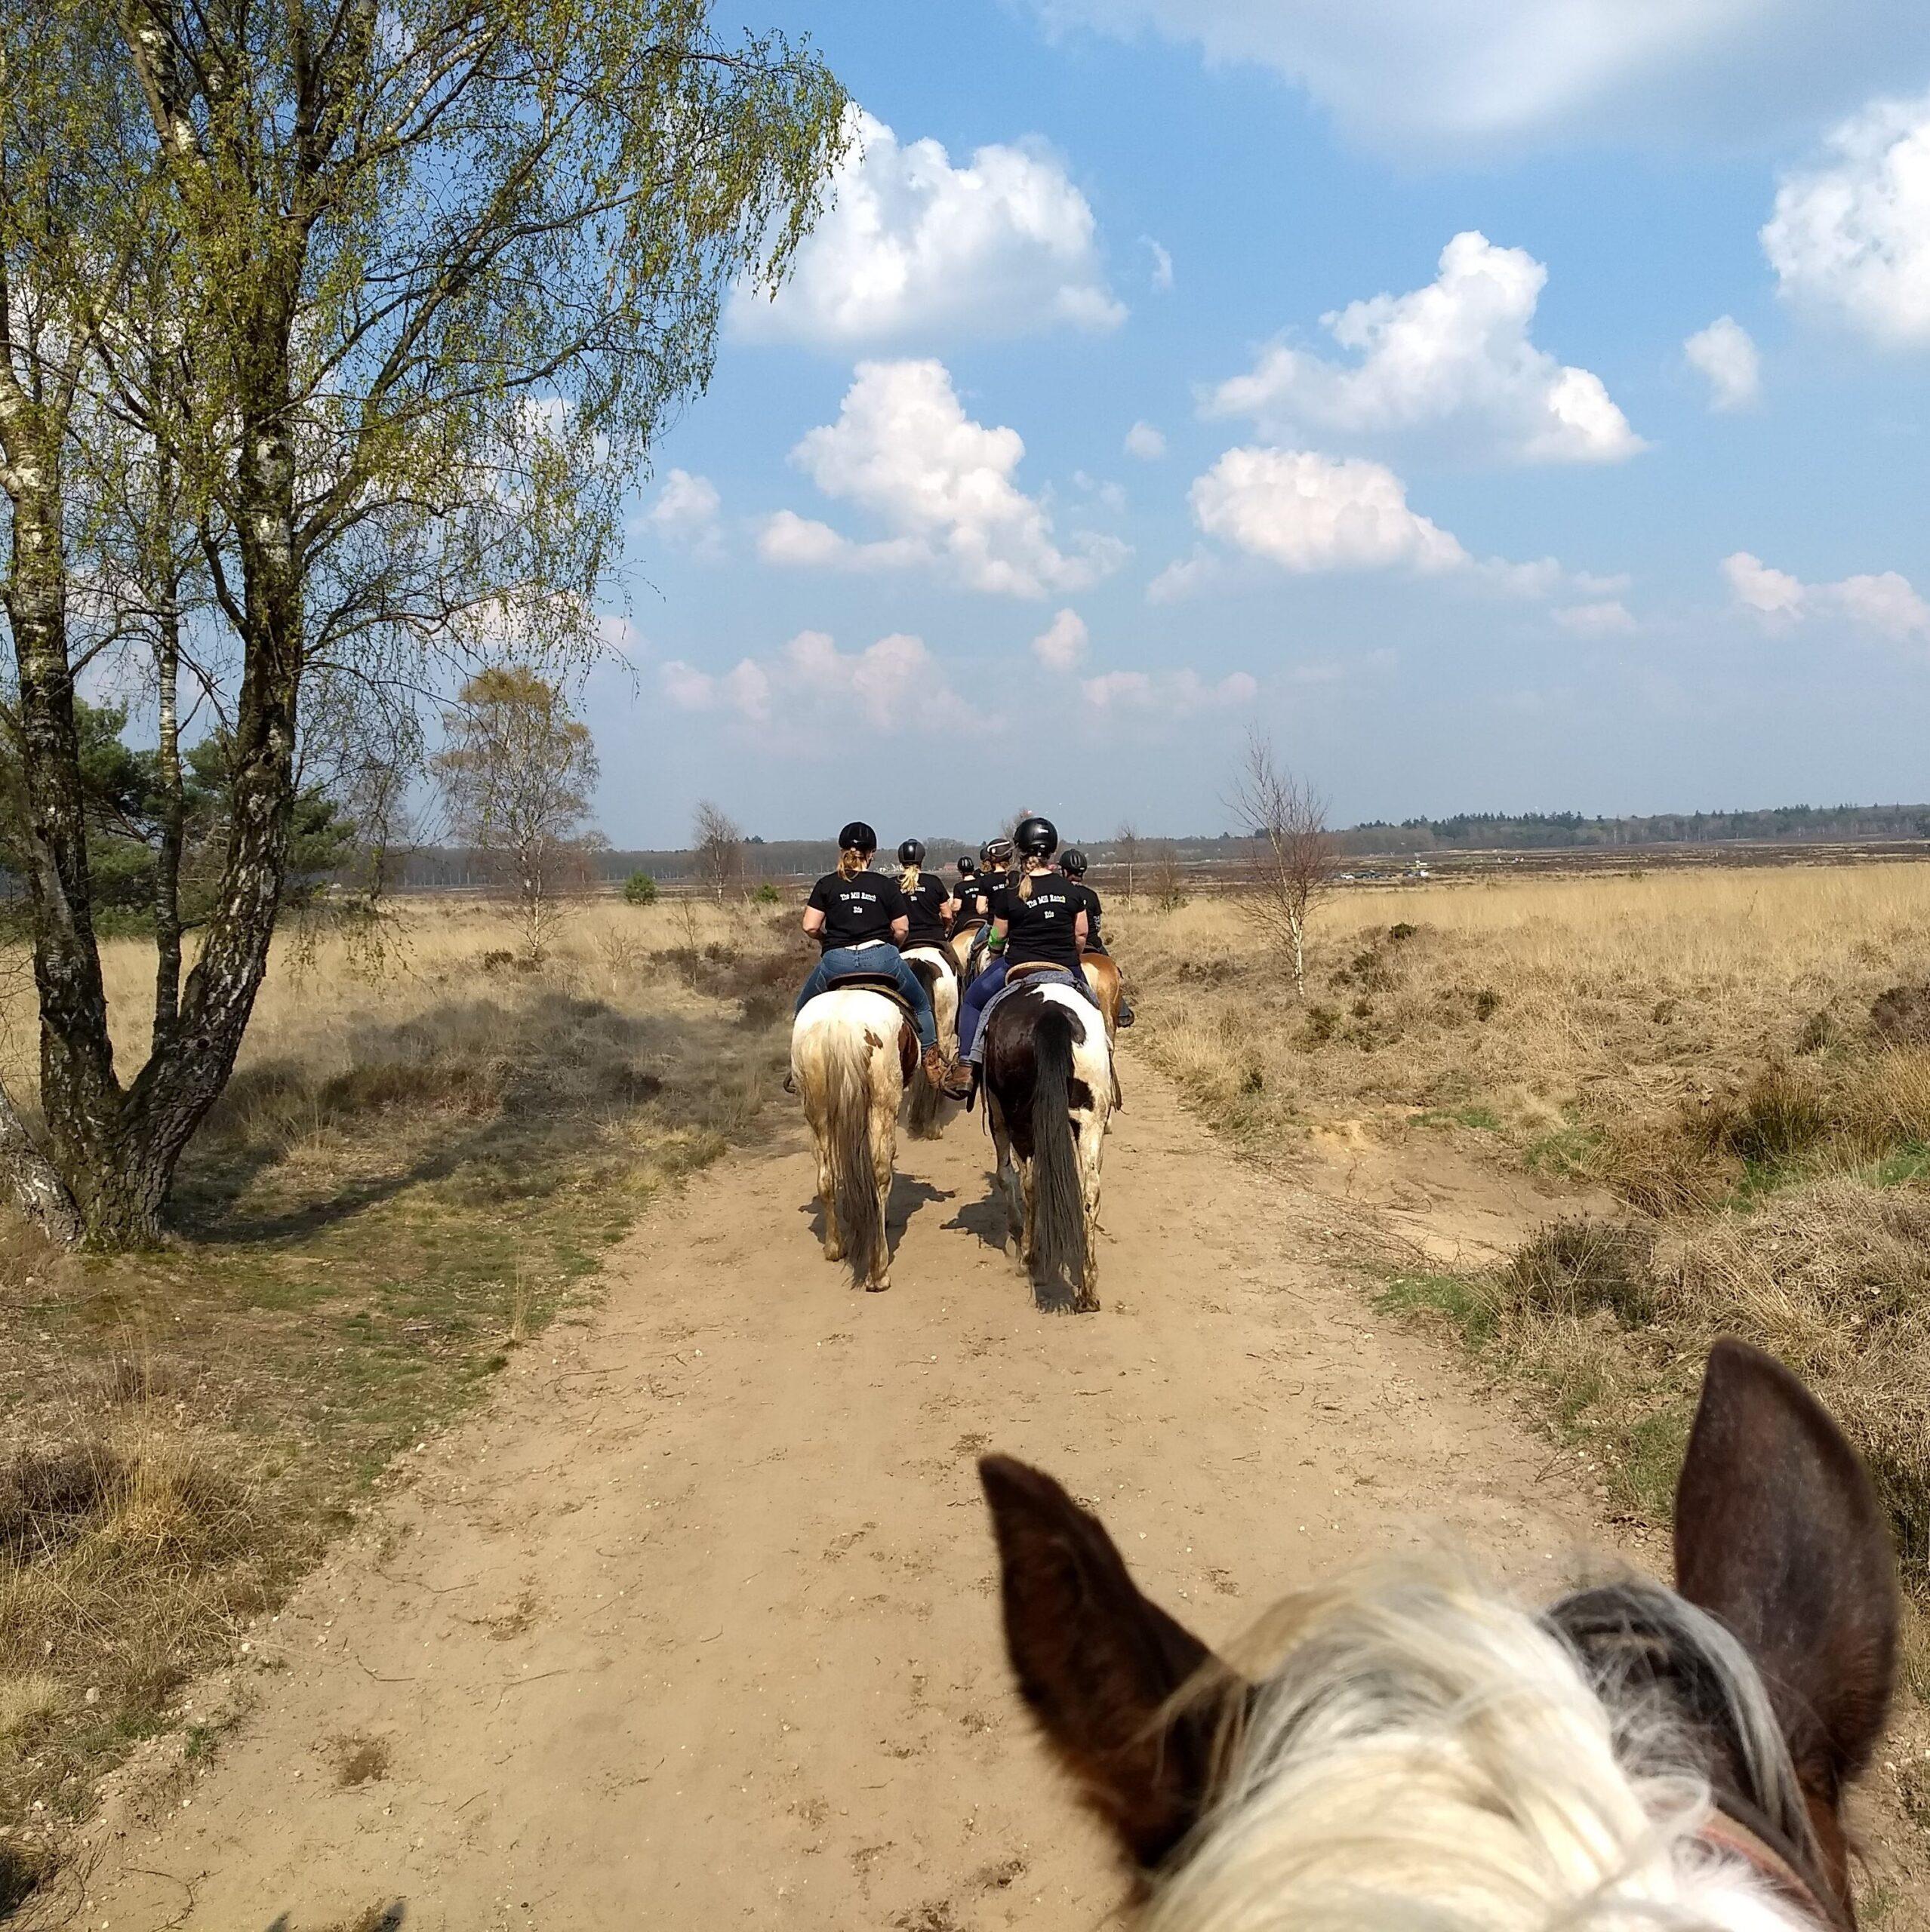 Bij The Mill Ranch kun je afwisselende buitenritten in western-stijl doen. Hier: Zomerse buitenrit op de Ginkelse Heide